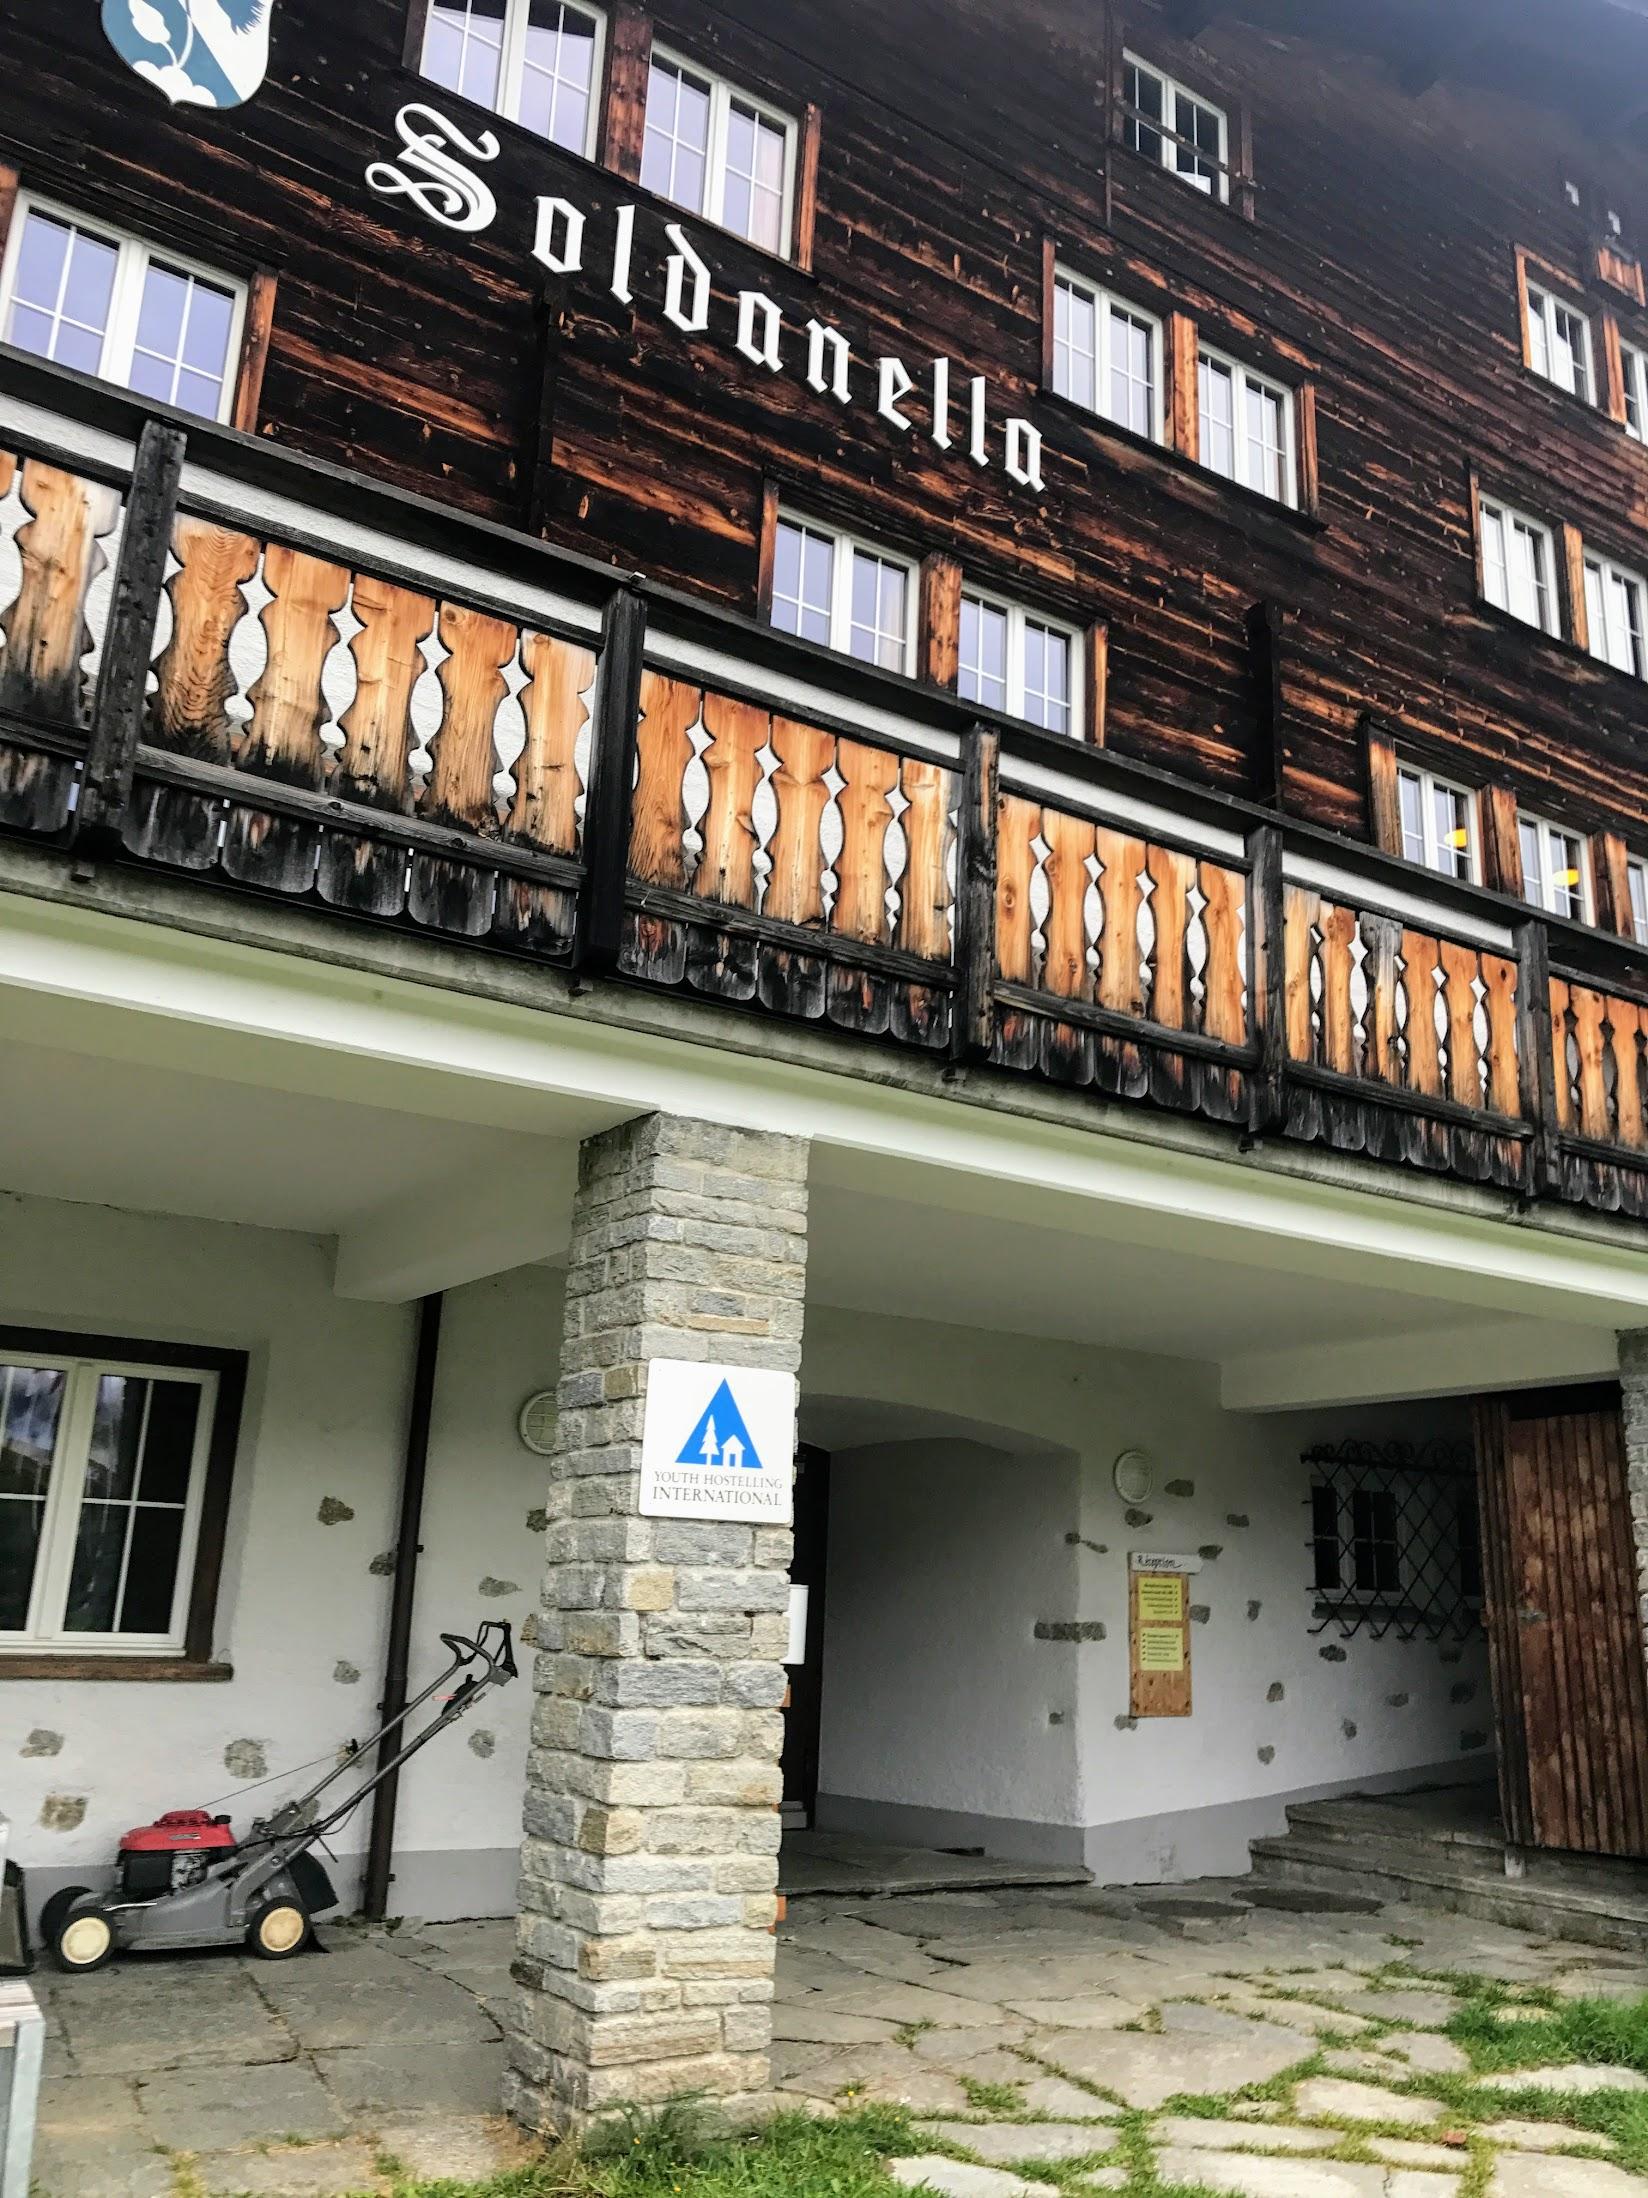 Klosters hostel